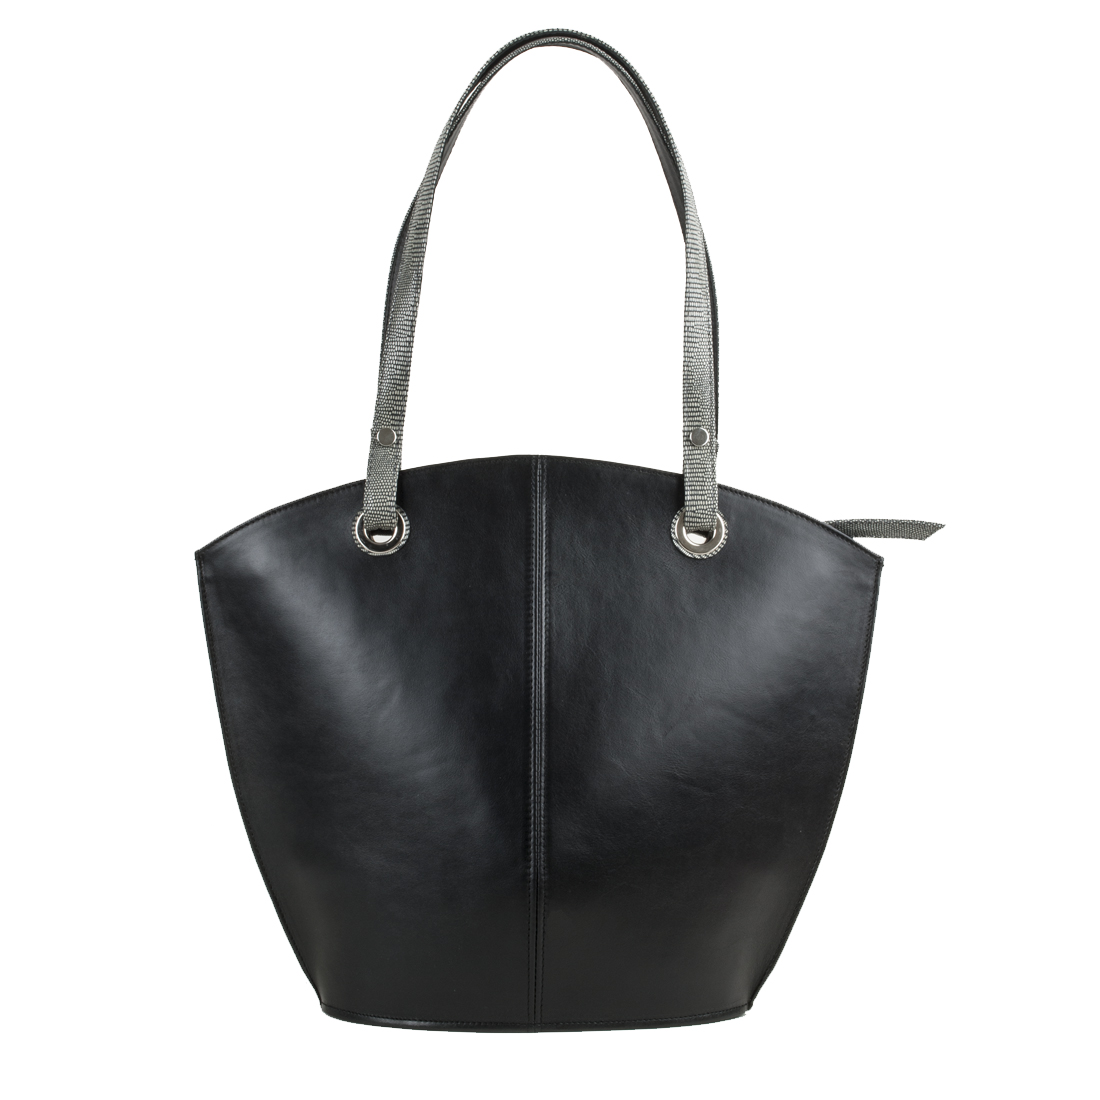 Audrey Black Leather Tote Bag